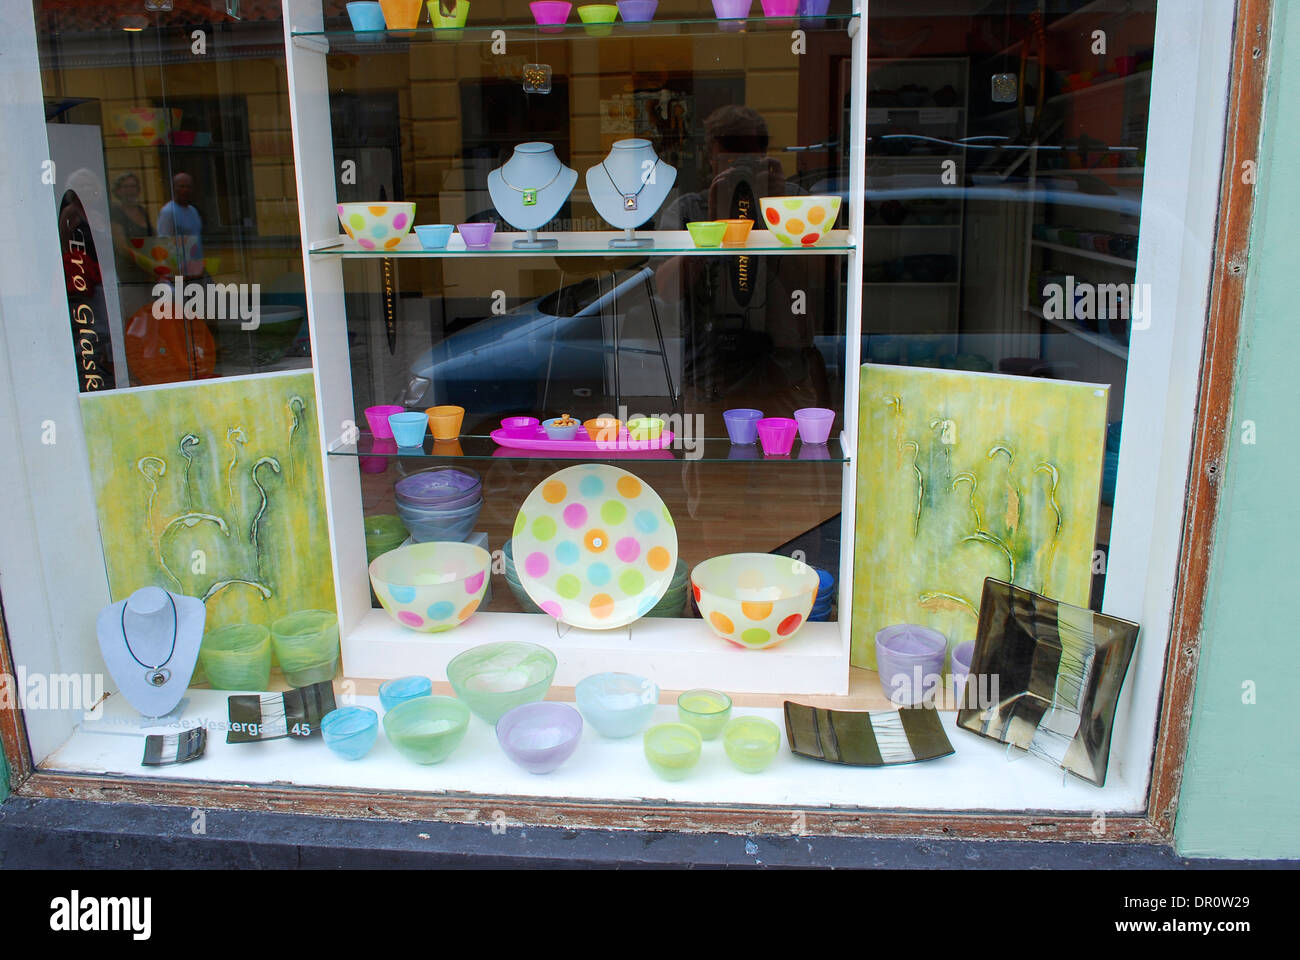 Aero island, shop window in Aeroskobing, fyn, Denmark, Scandinavia, Europe - Stock Image